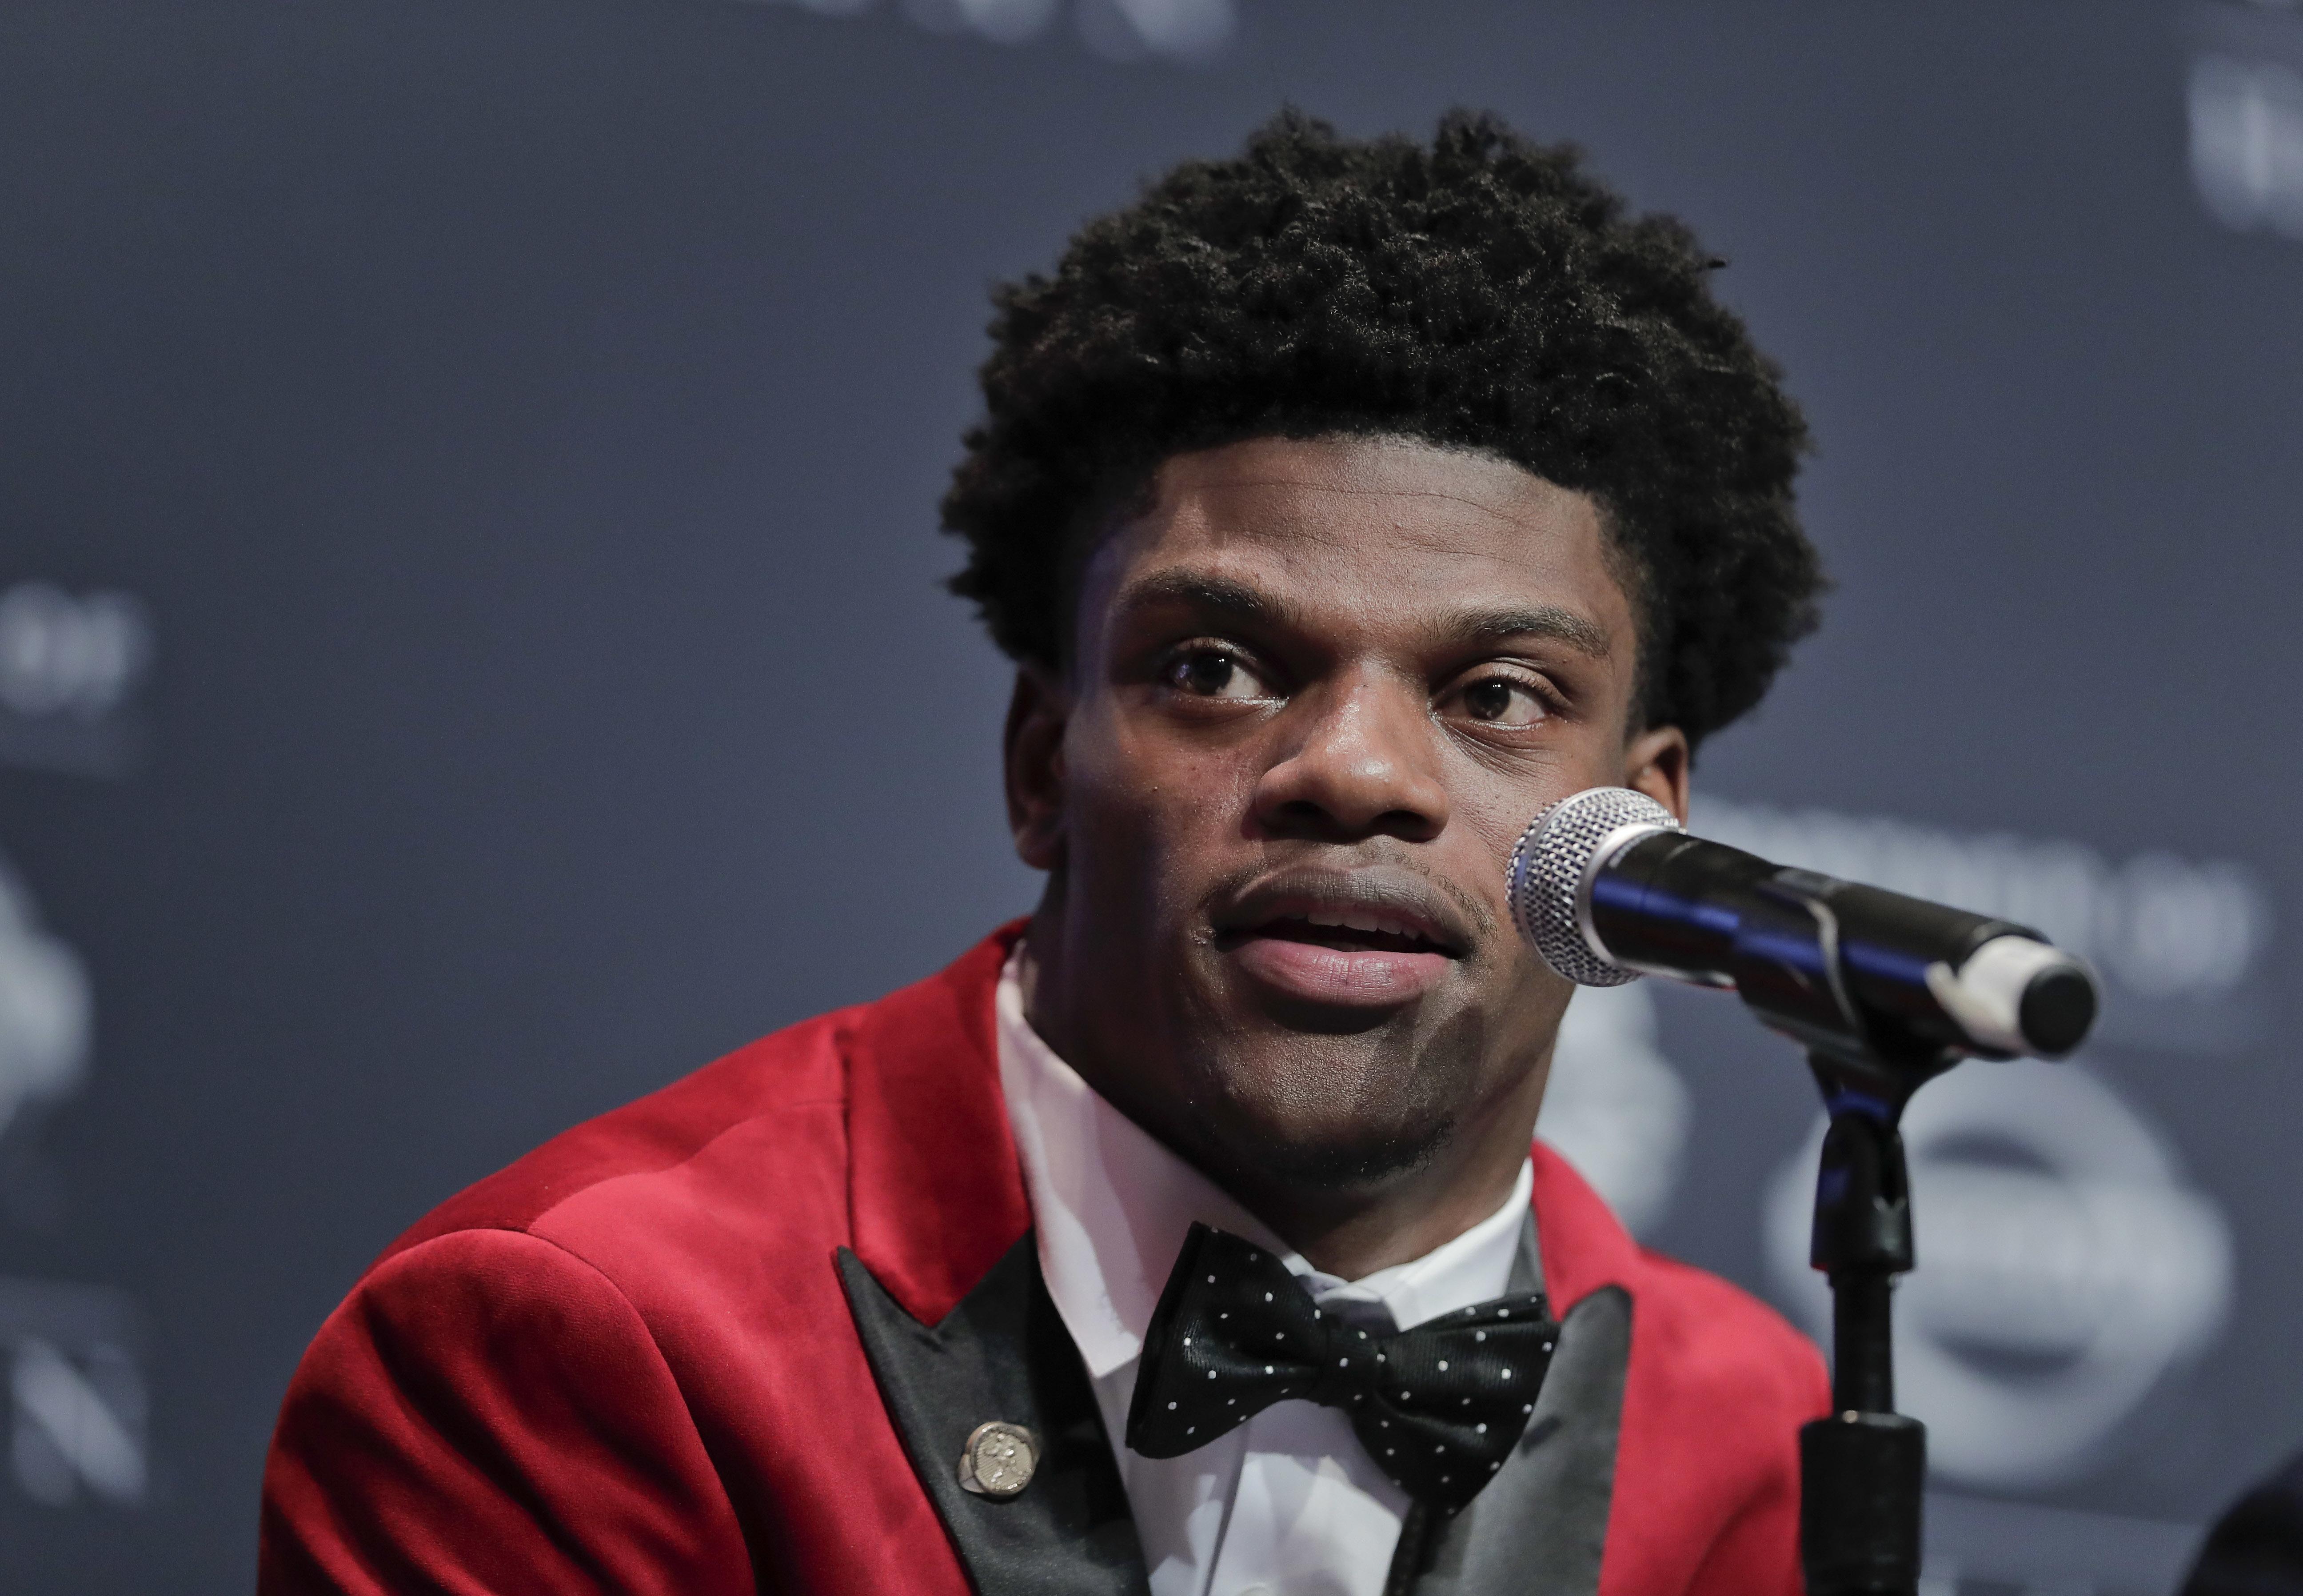 Louisville's Lamar Jackson wins Heisman Trophy | The Spokesman-Review